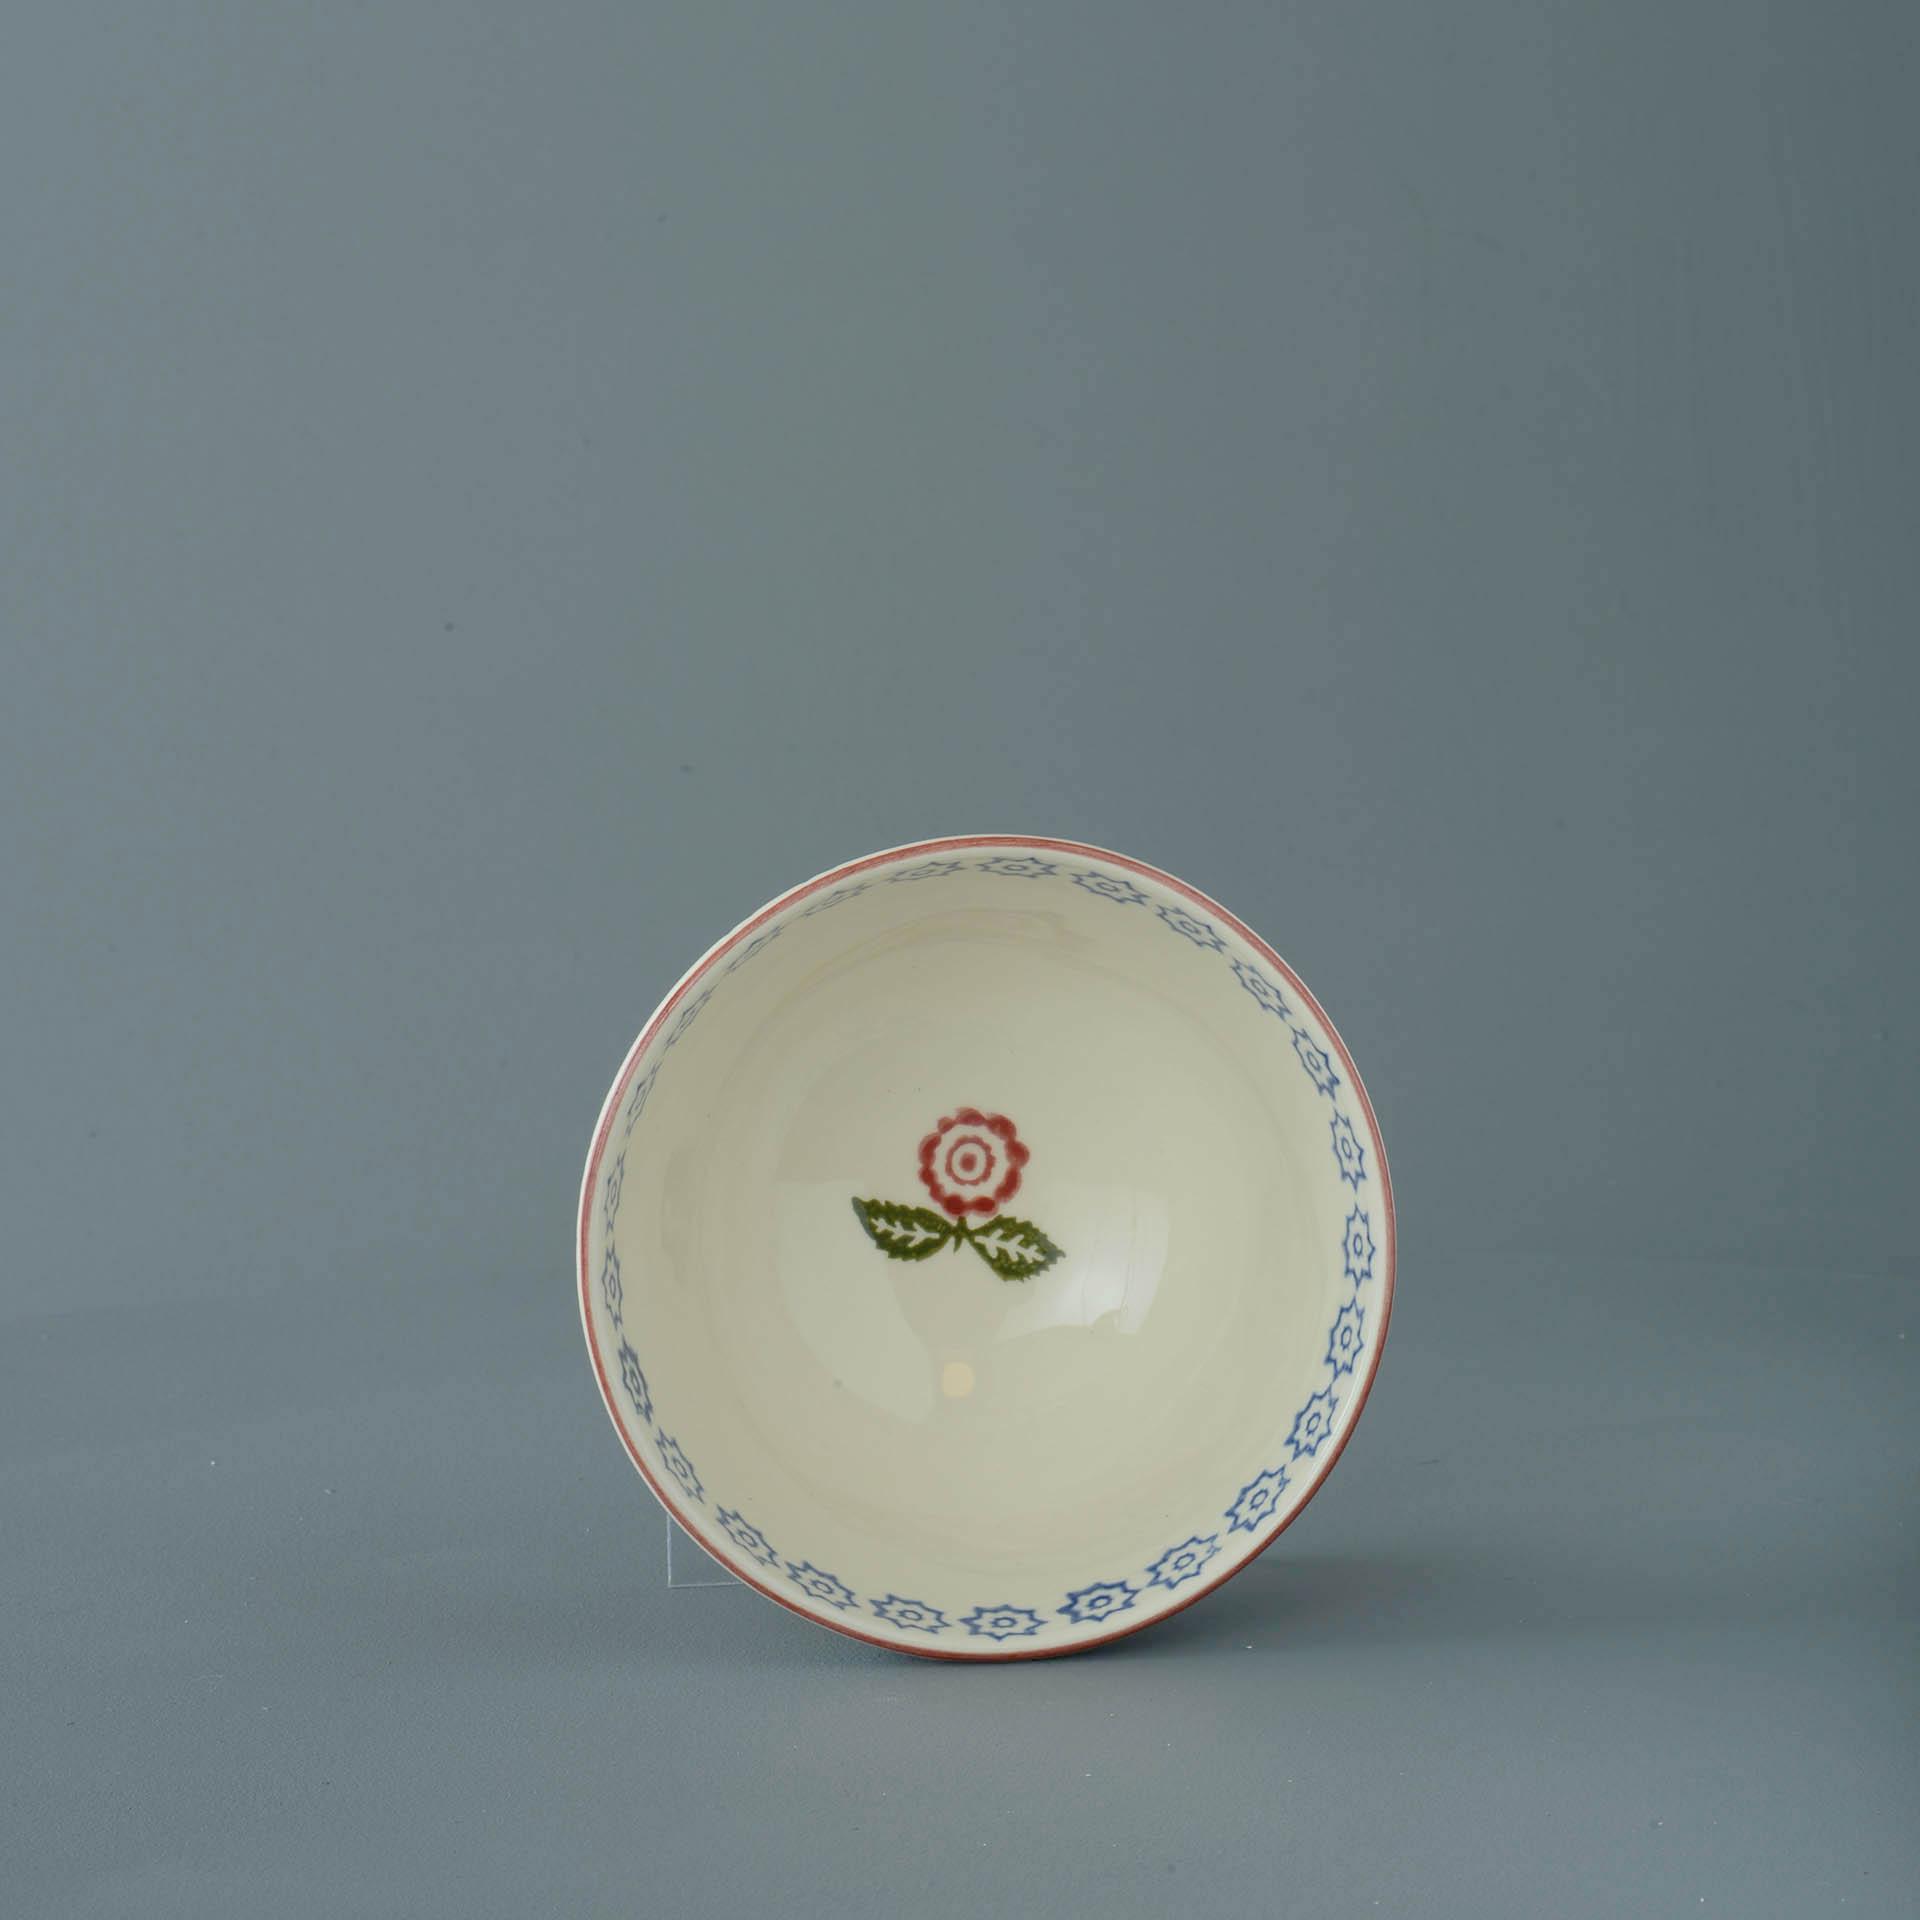 Victorian Floral Cereal Bowl 7 x 13cm